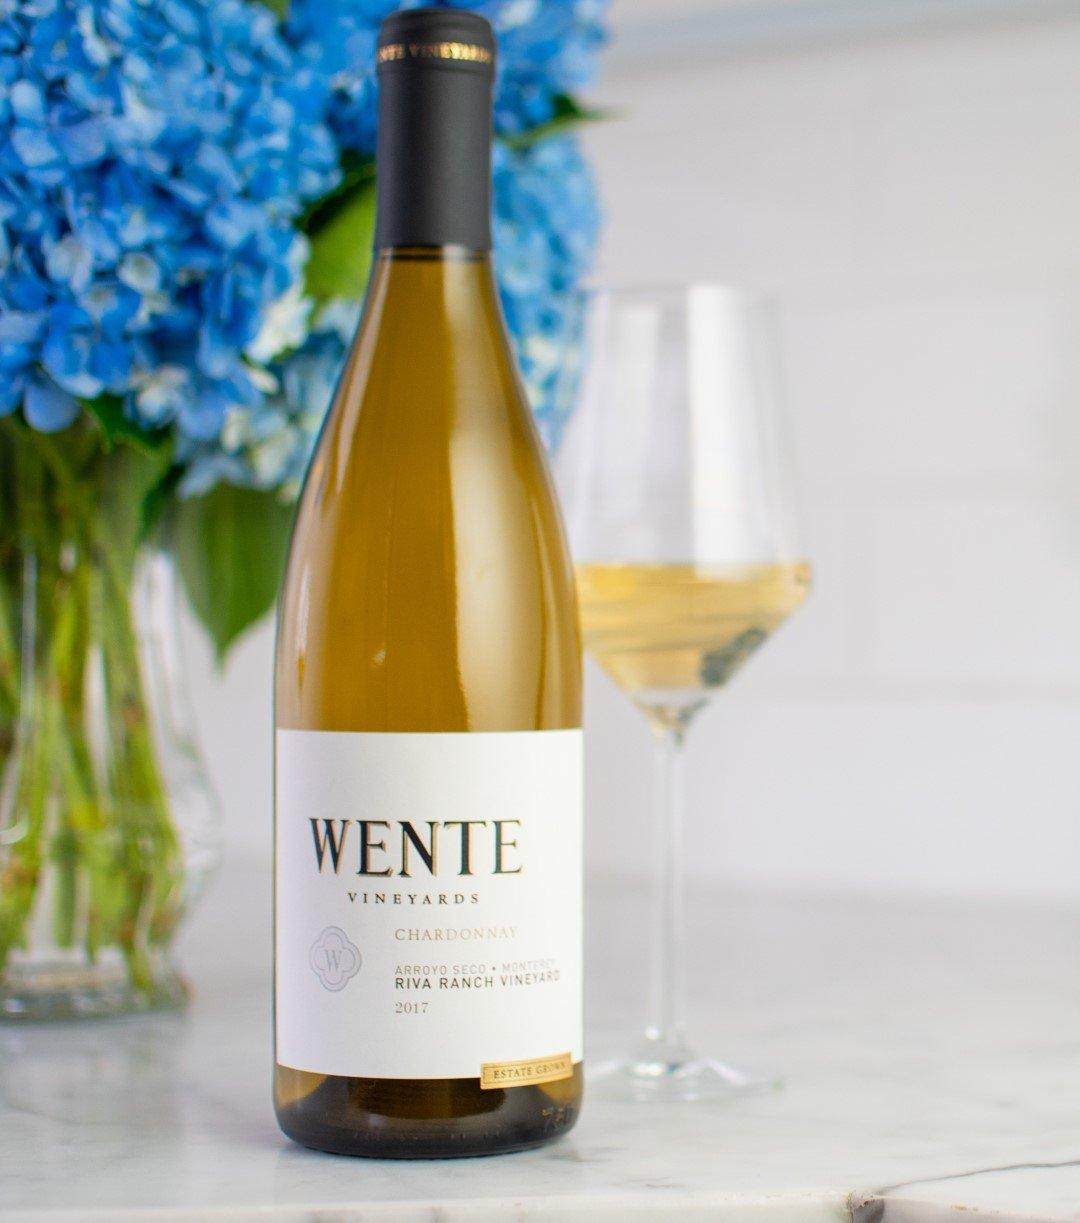 2017 Wente Chardonnay Riva Ranch Vineyard